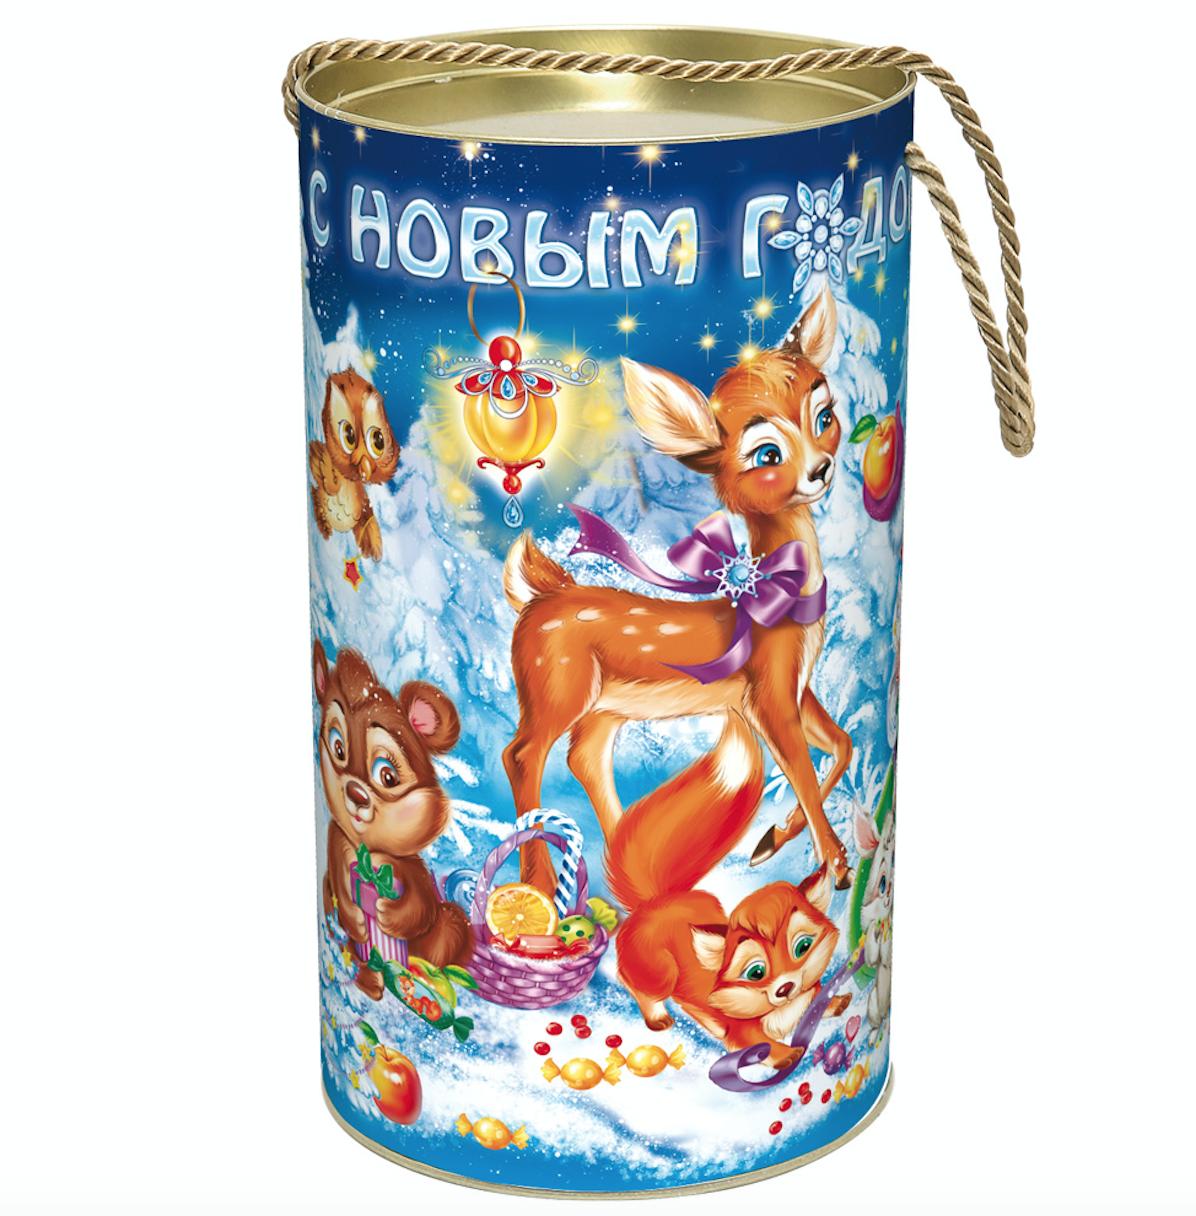 Sweet Christmas Gift Russian Candy, Gift Bag, Tube, 0.9 kg/ 2 lbs